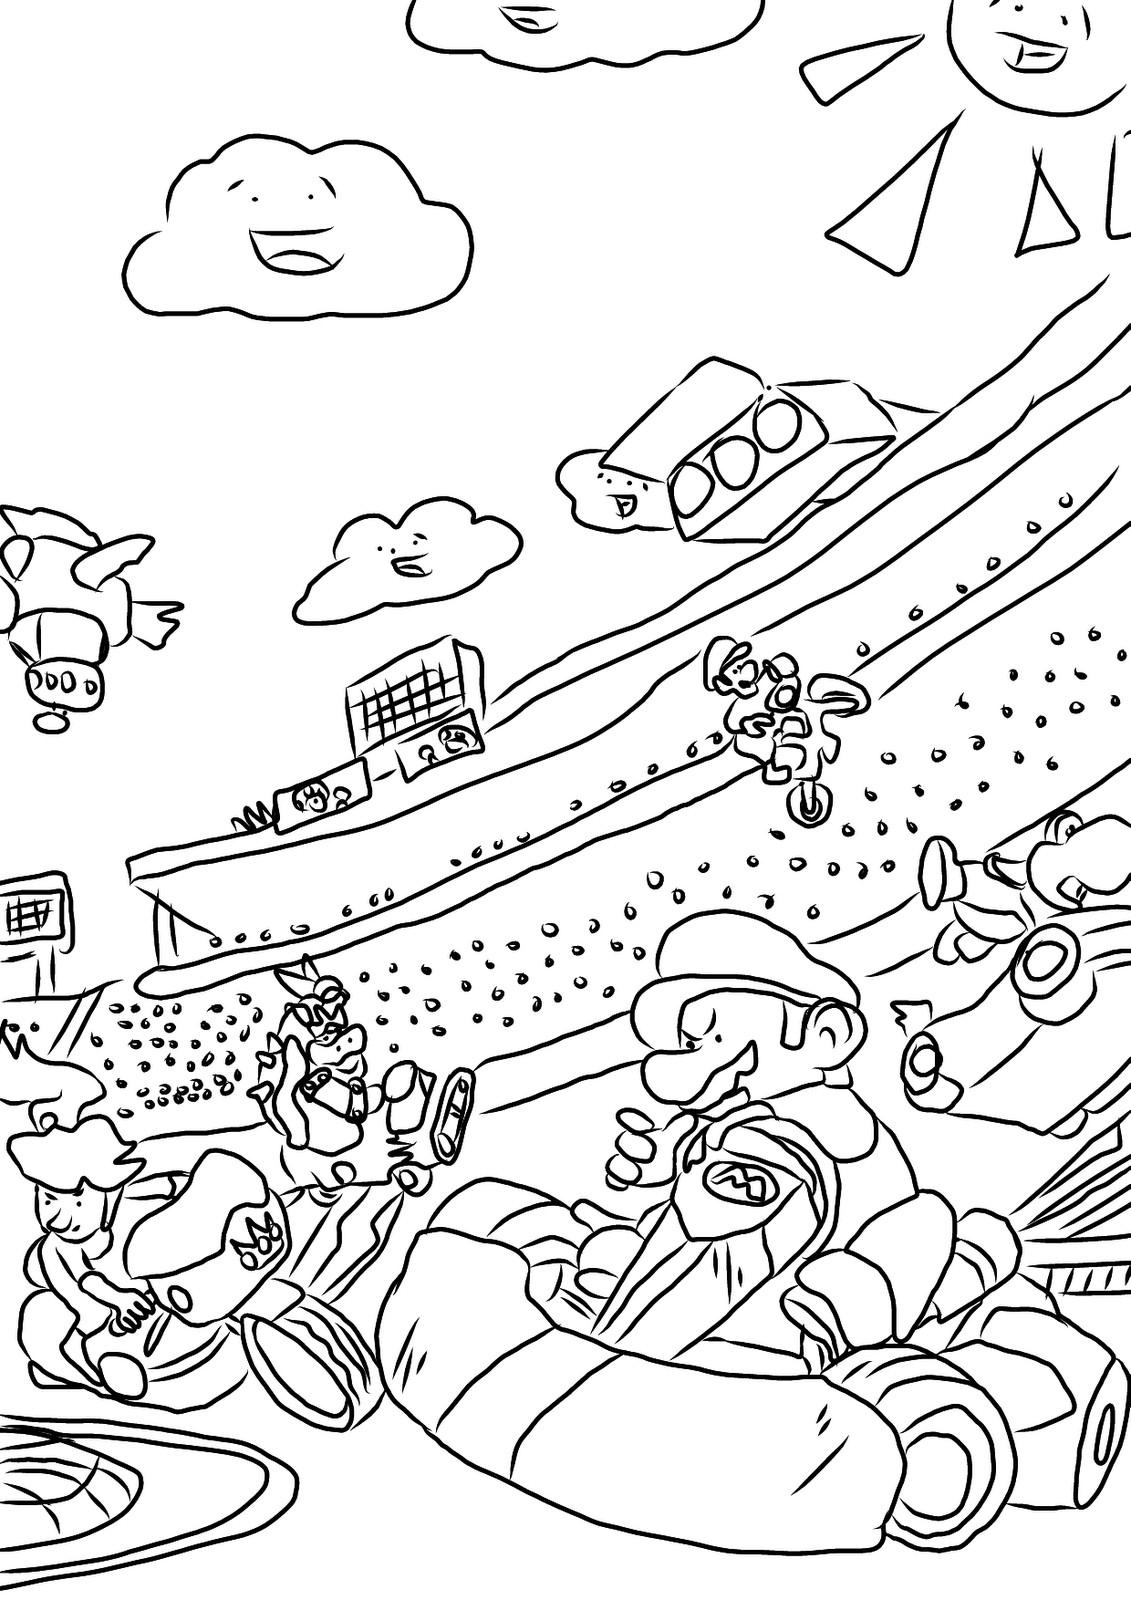 Mario Kart Coloring Pages  Mario Kart Coloring Pages Best Coloring Pages For Kids